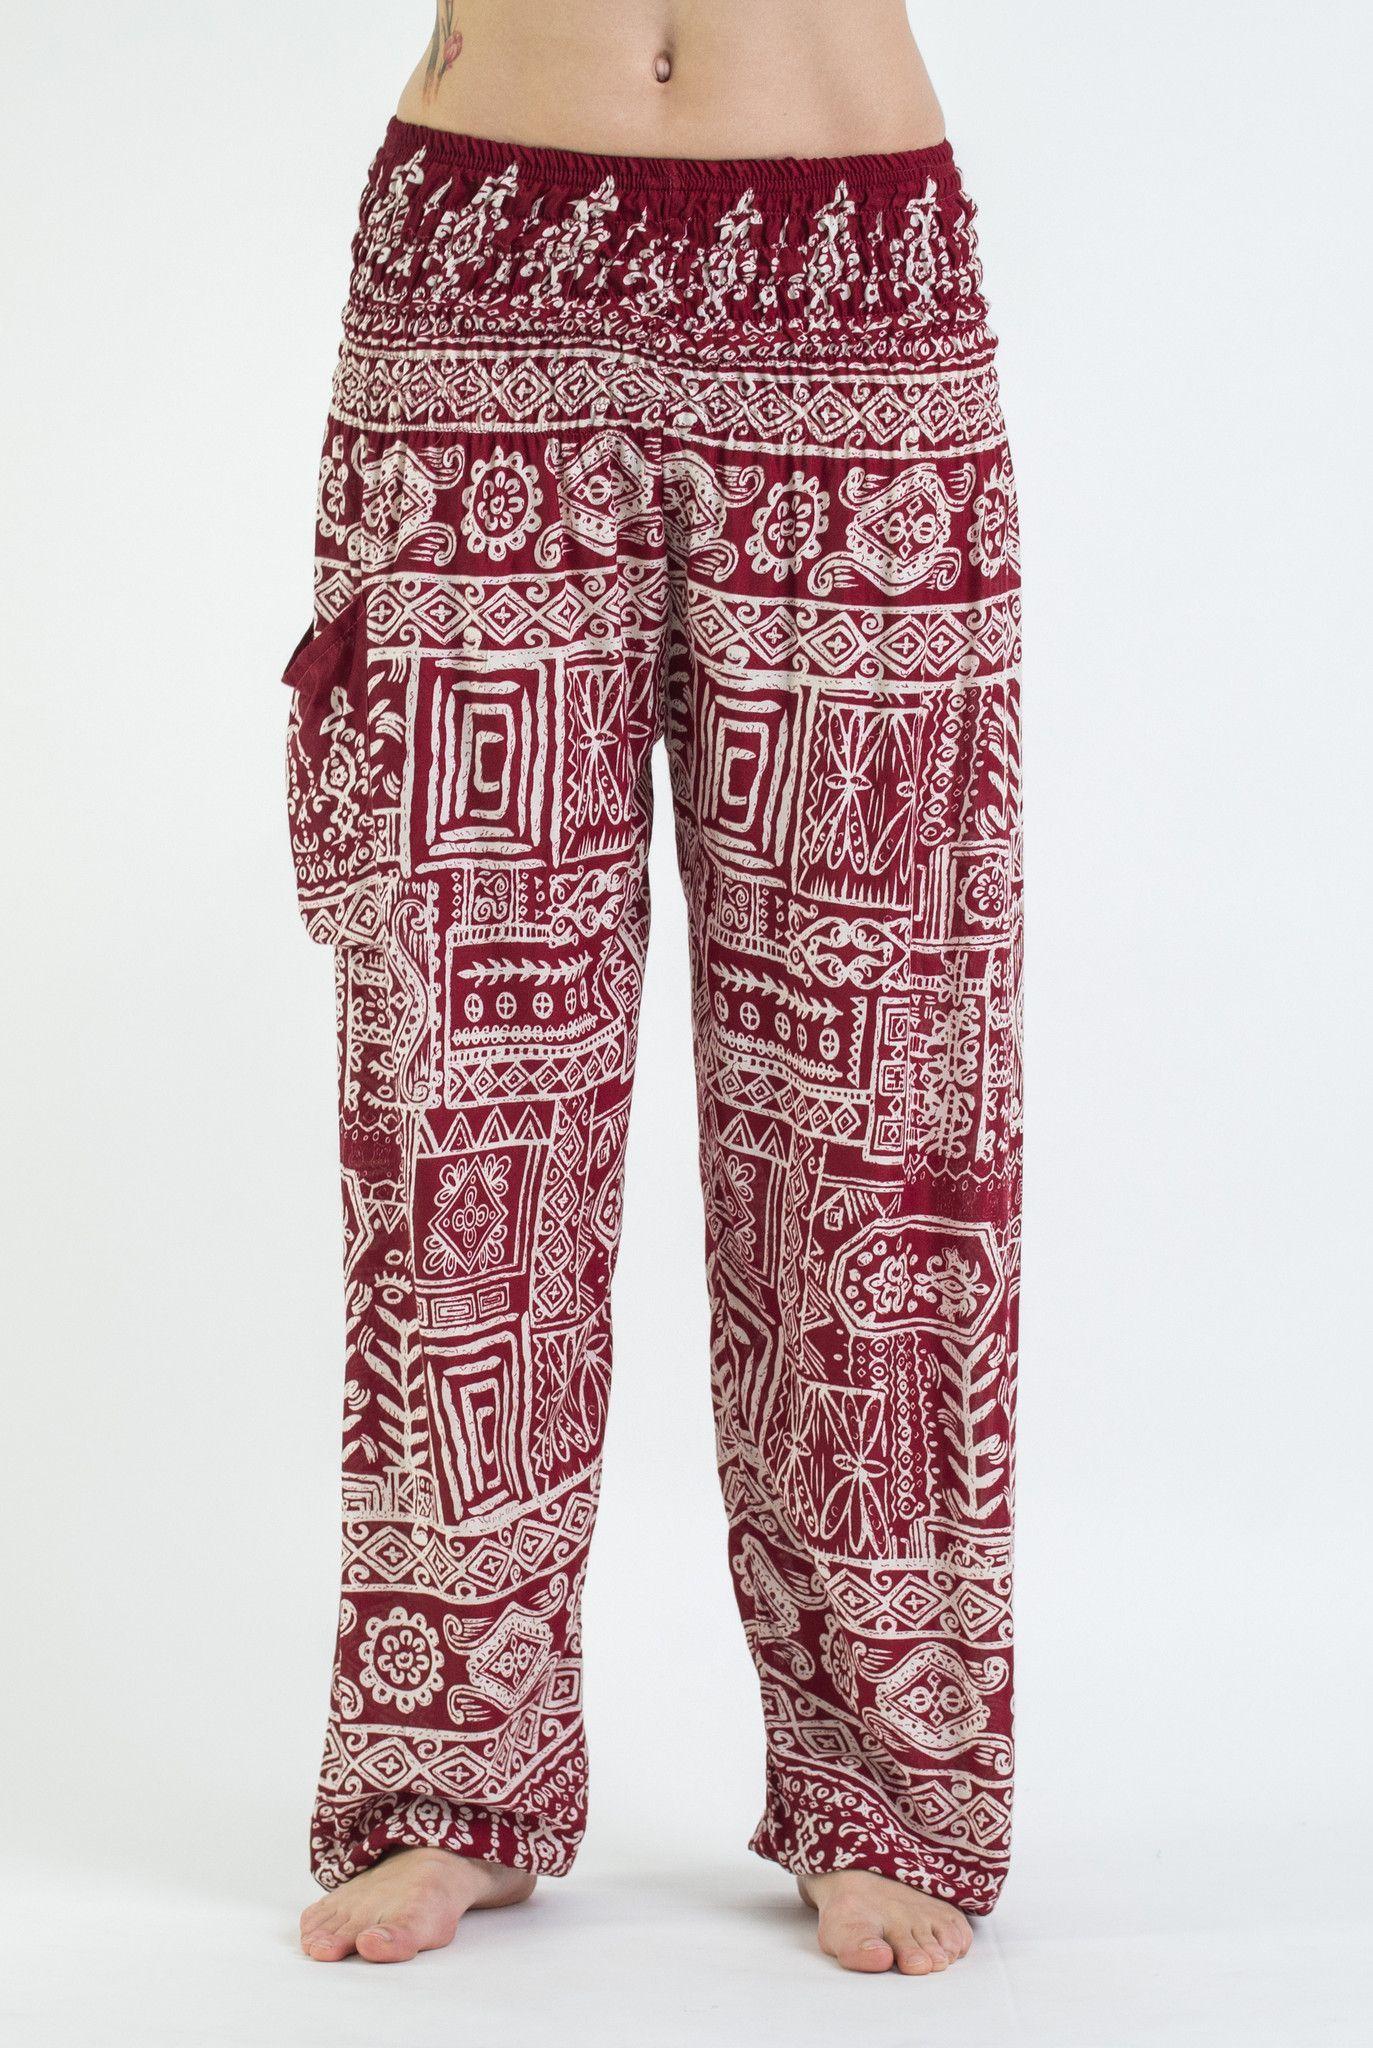 Thailand Harem Genie Unisex Thai Super Soft Yoga Pants Elastic waist,  elastic…